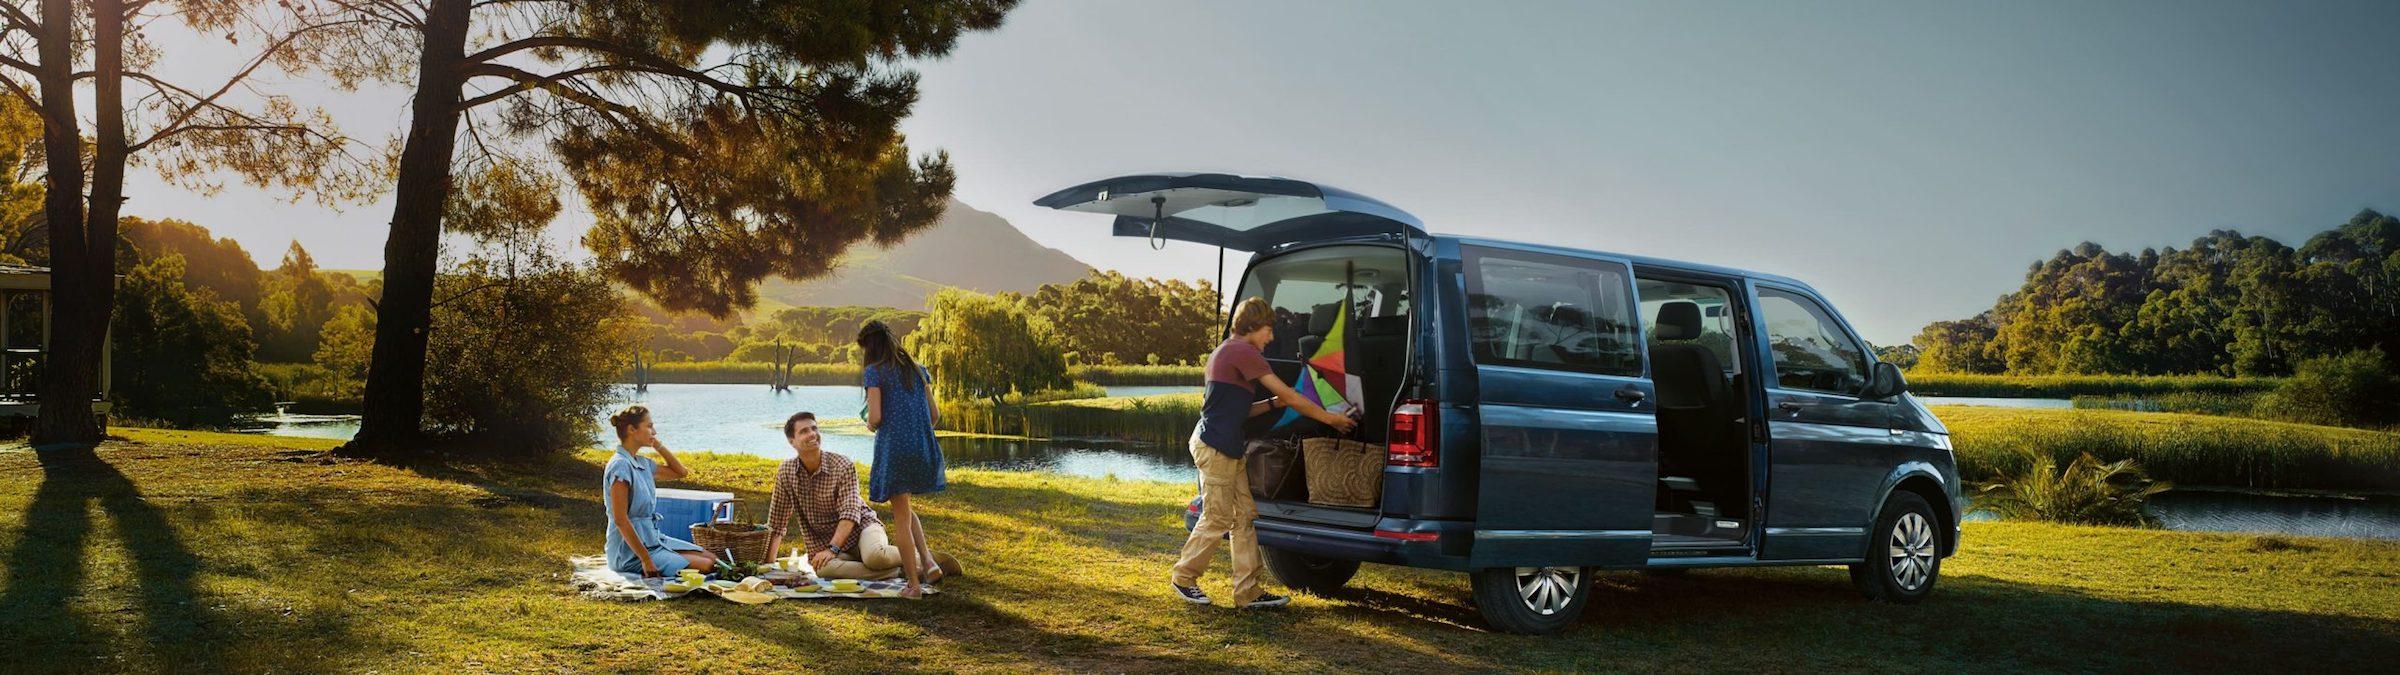 Volkswagen Multivan Familie Angebot München